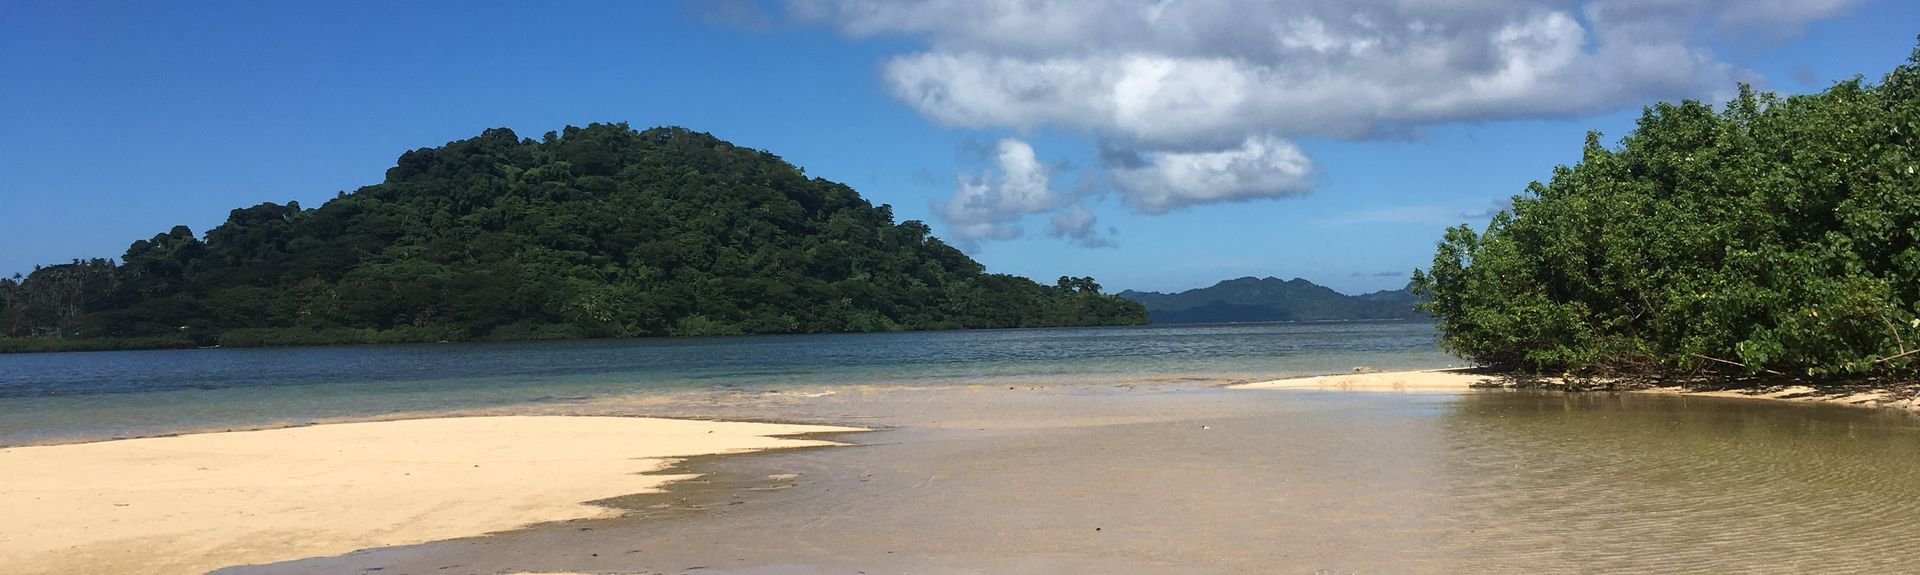 Cakaudrove, Northern Division, Fiji